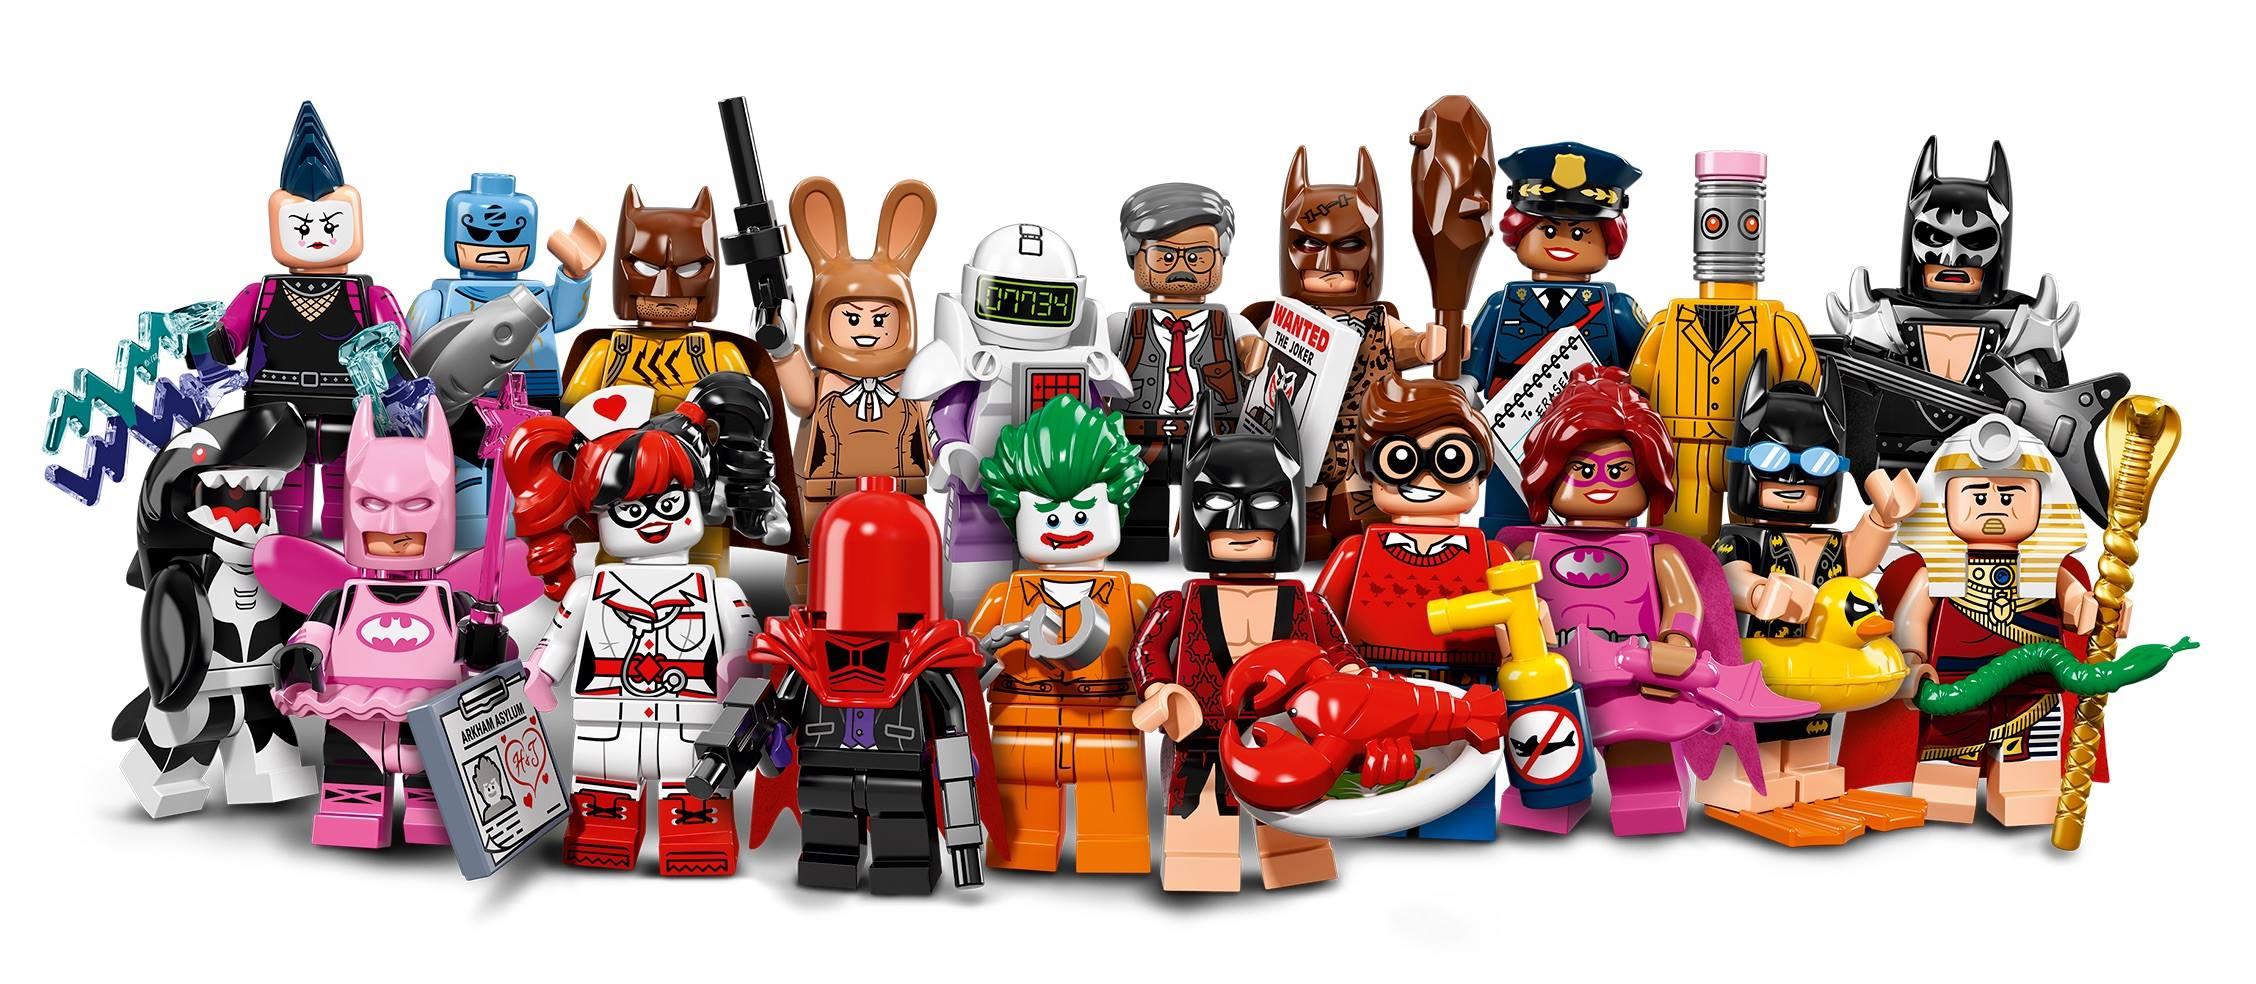 Lego Batman Movie Red Hood Minifigure Series 1